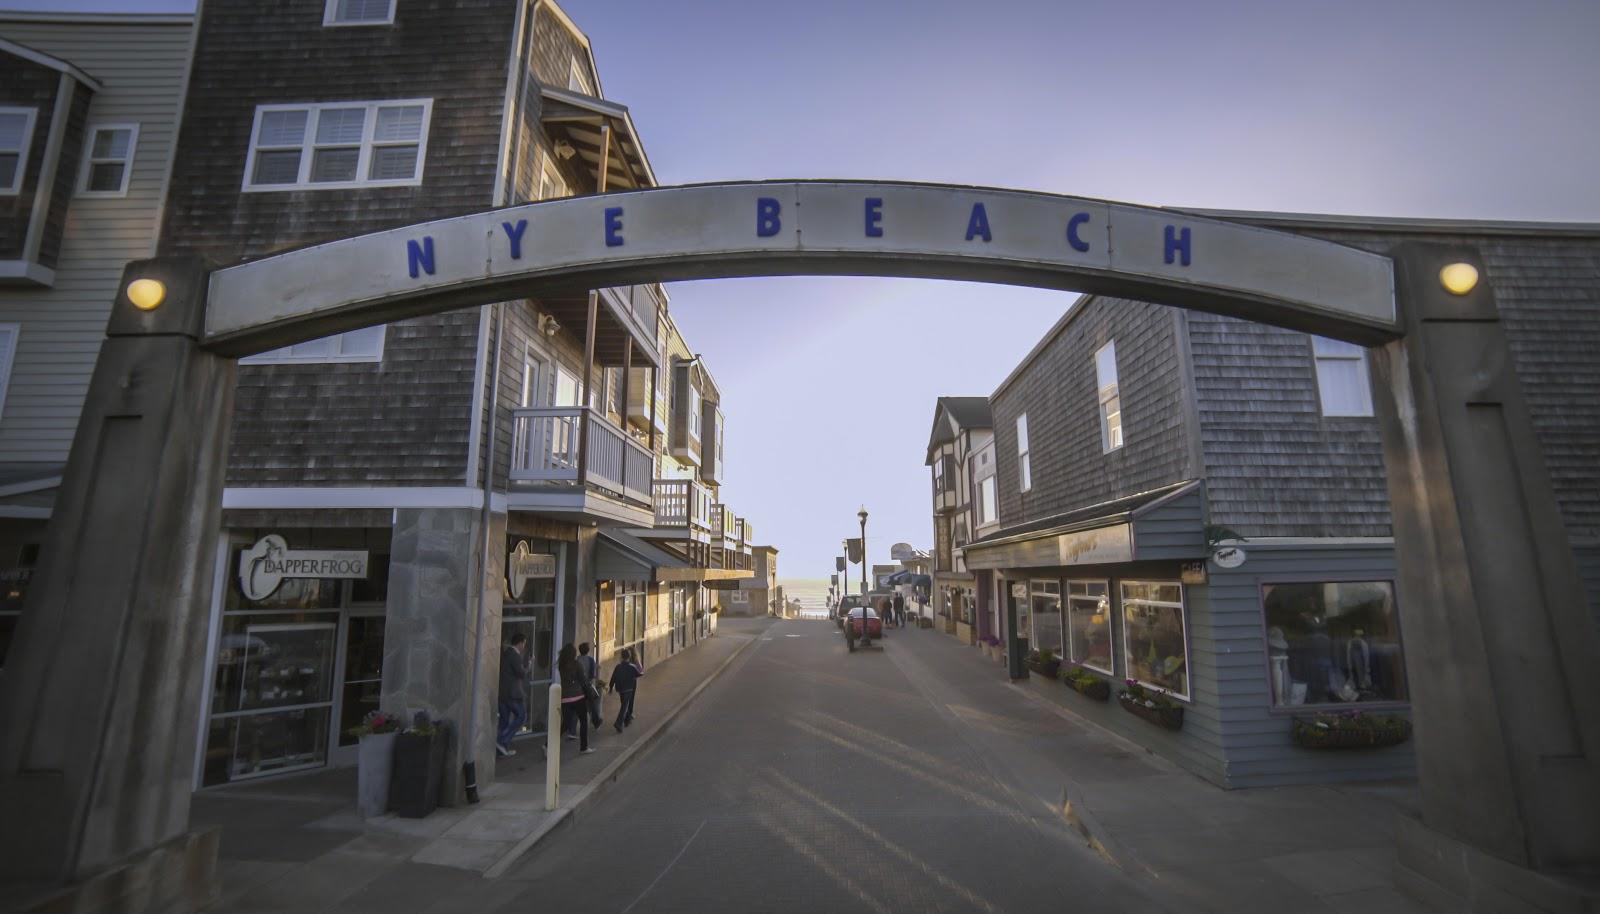 Newport's Nye Beach historic overlay district